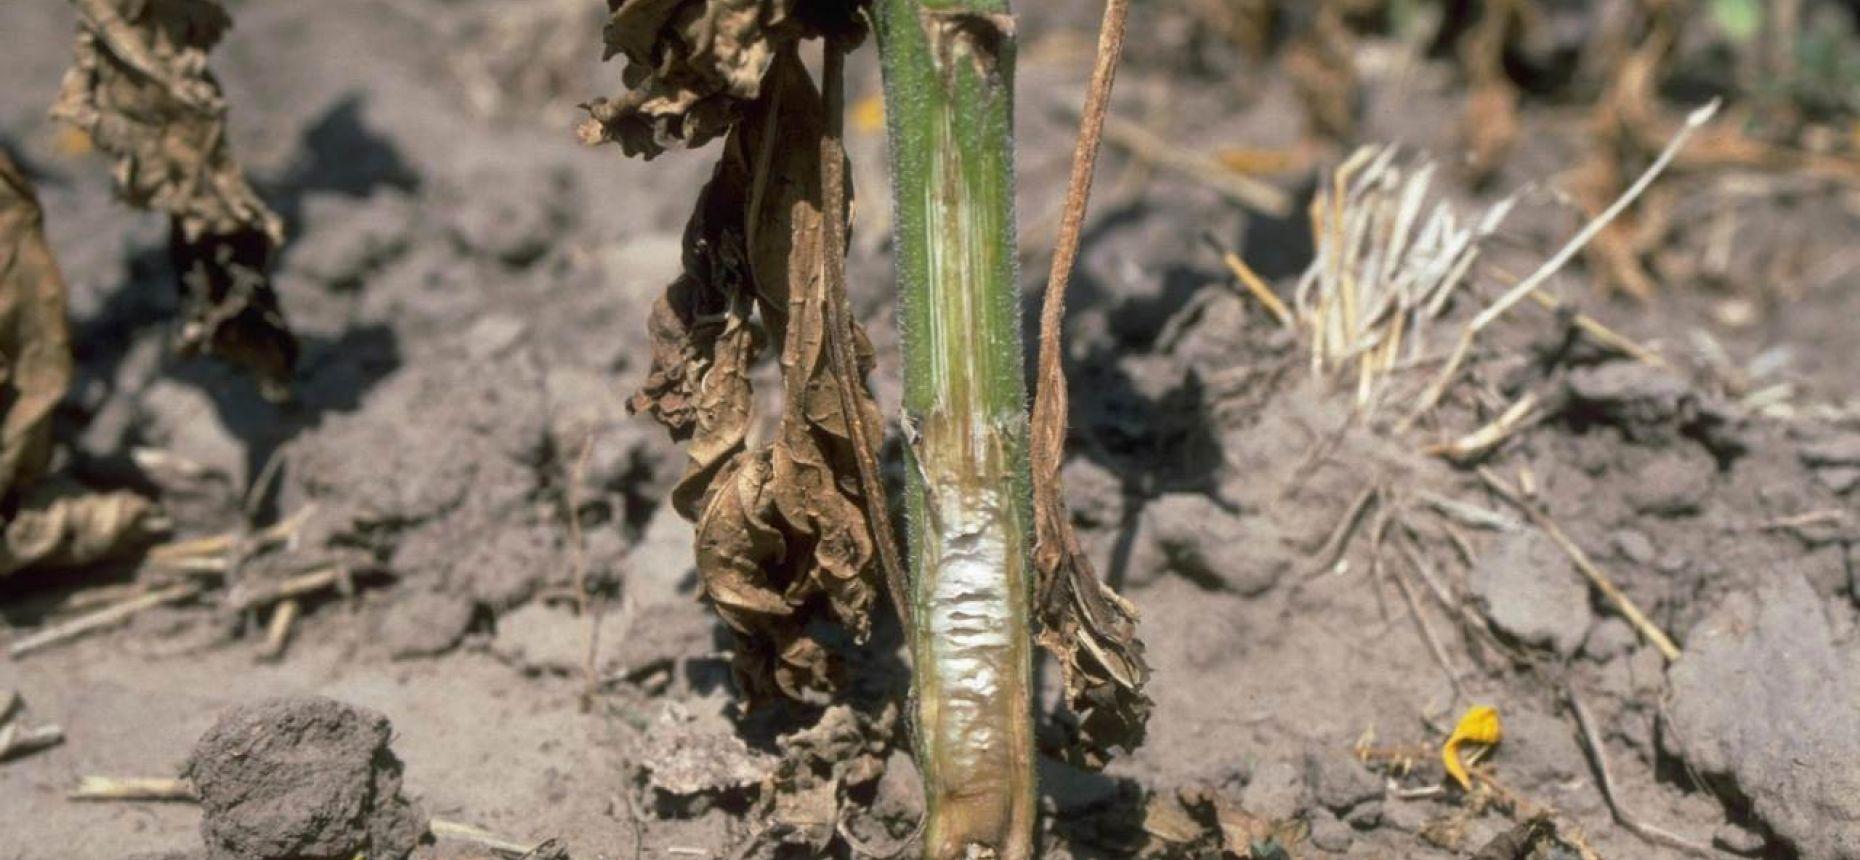 Вертициллезное увядание подсолнечника - Verticillium dahlia Kleb.(=Verticillium albo-atrum var. medium Wollenw)